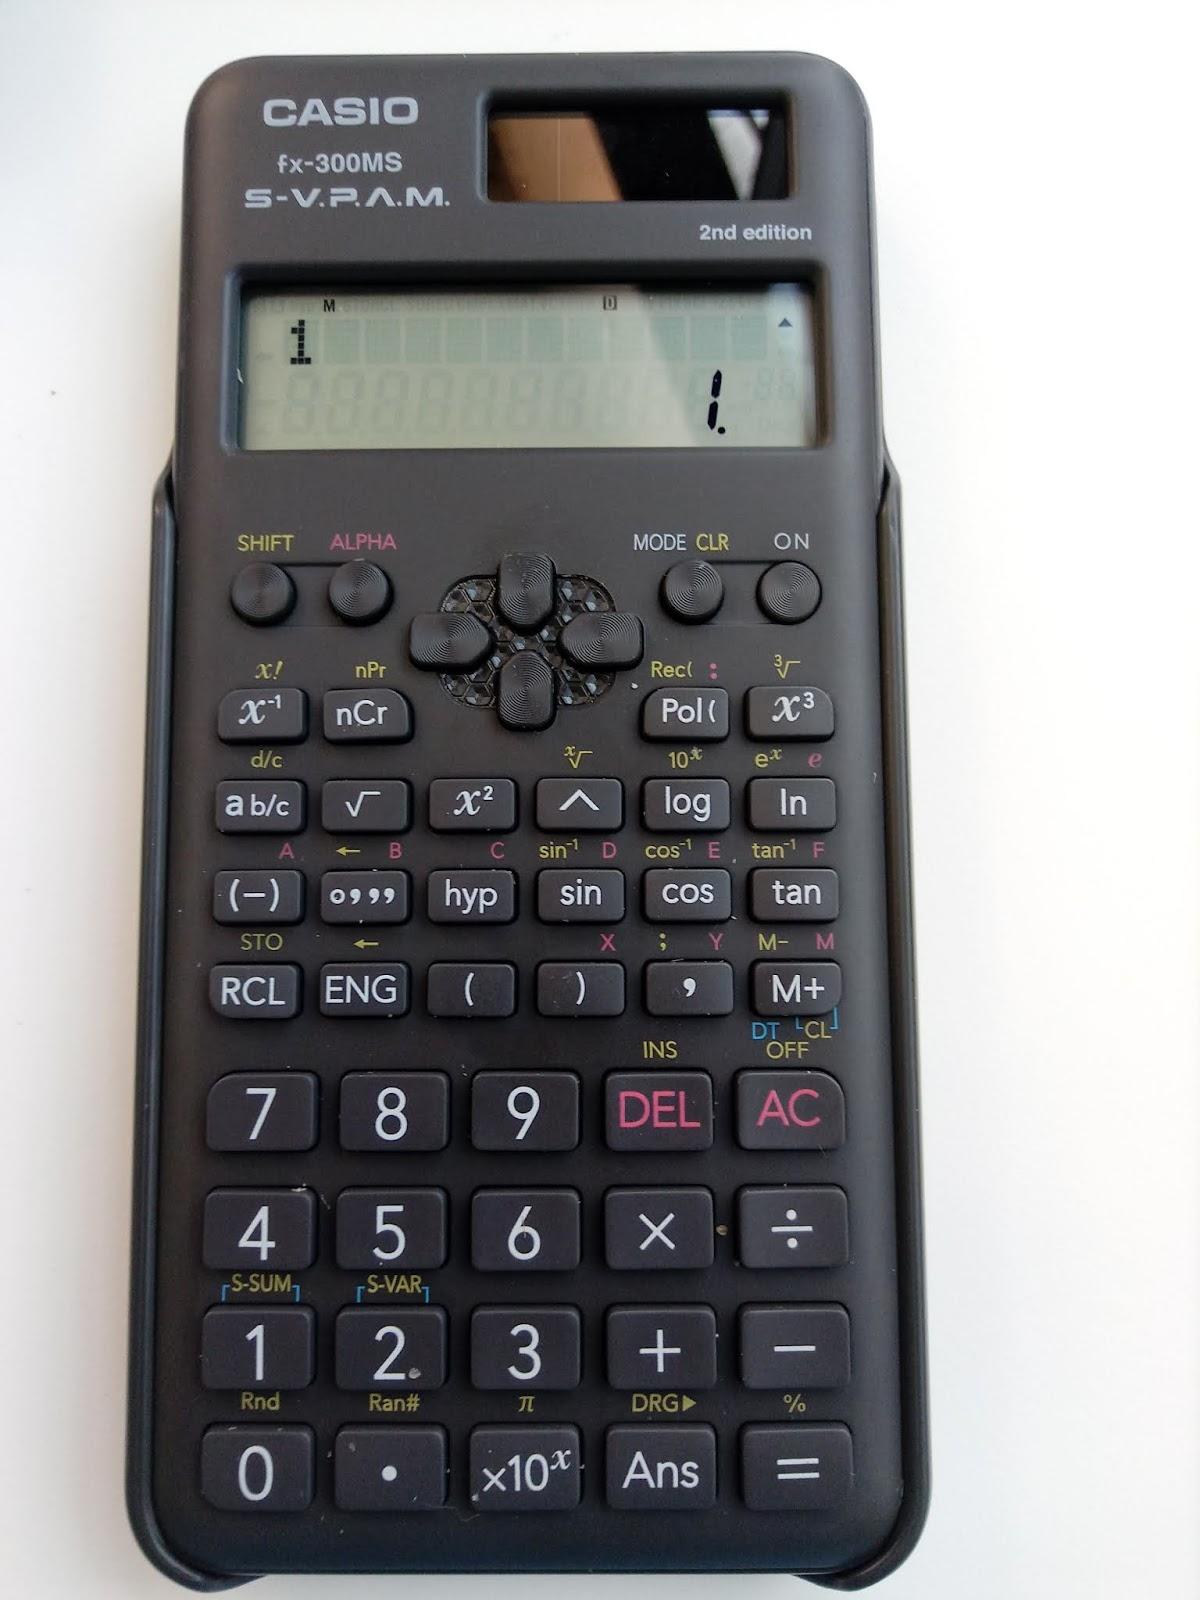 casio fx 300ms user manual